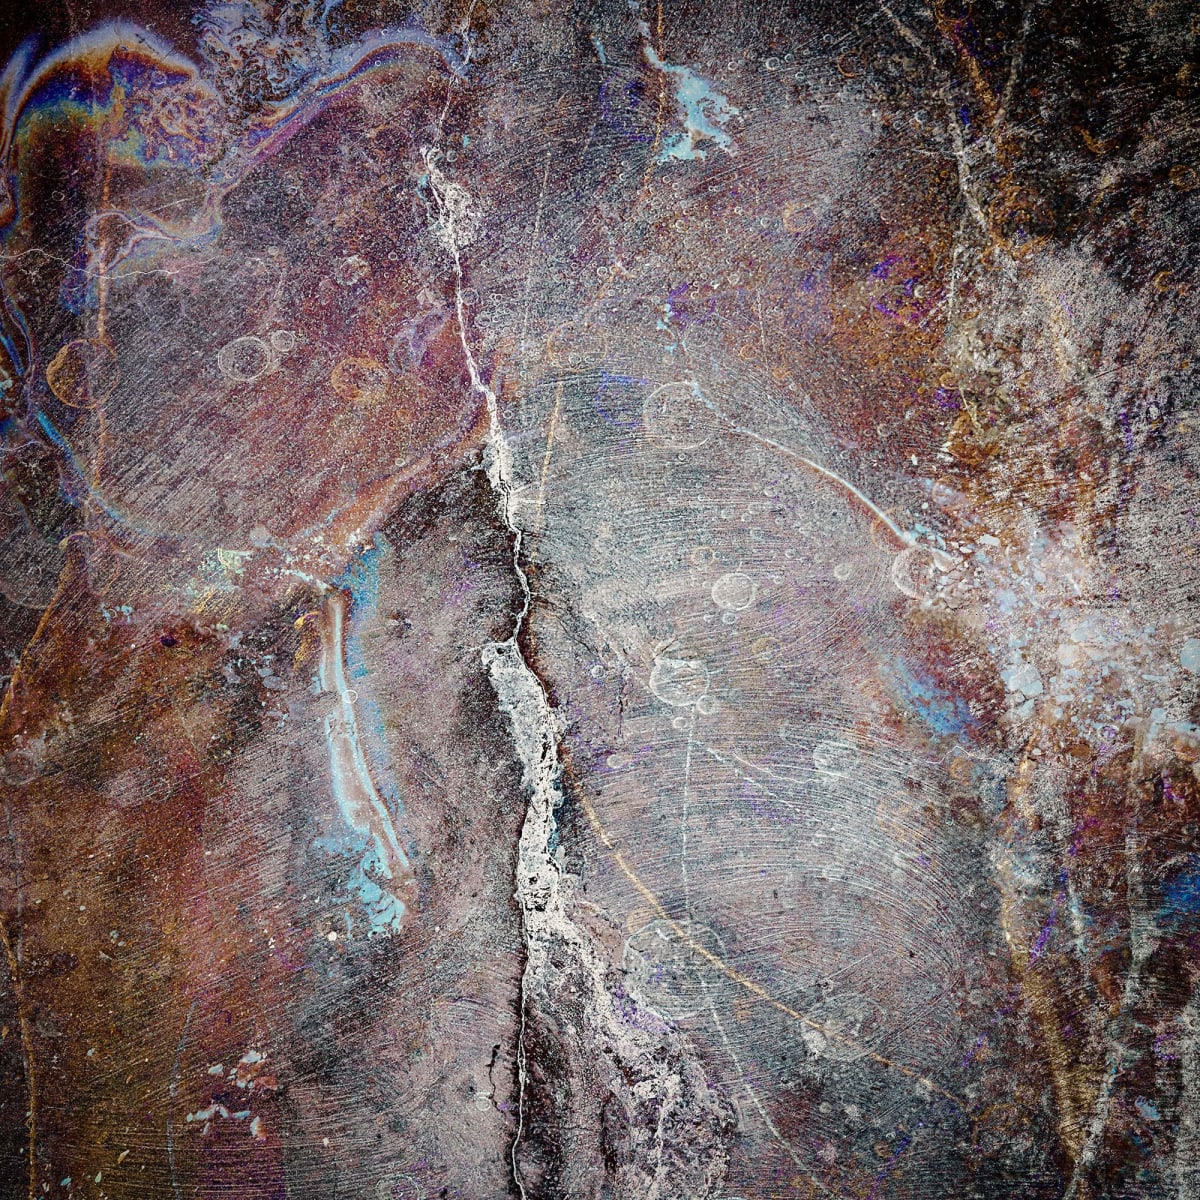 Valda Bailey, Cosmos III, 2019